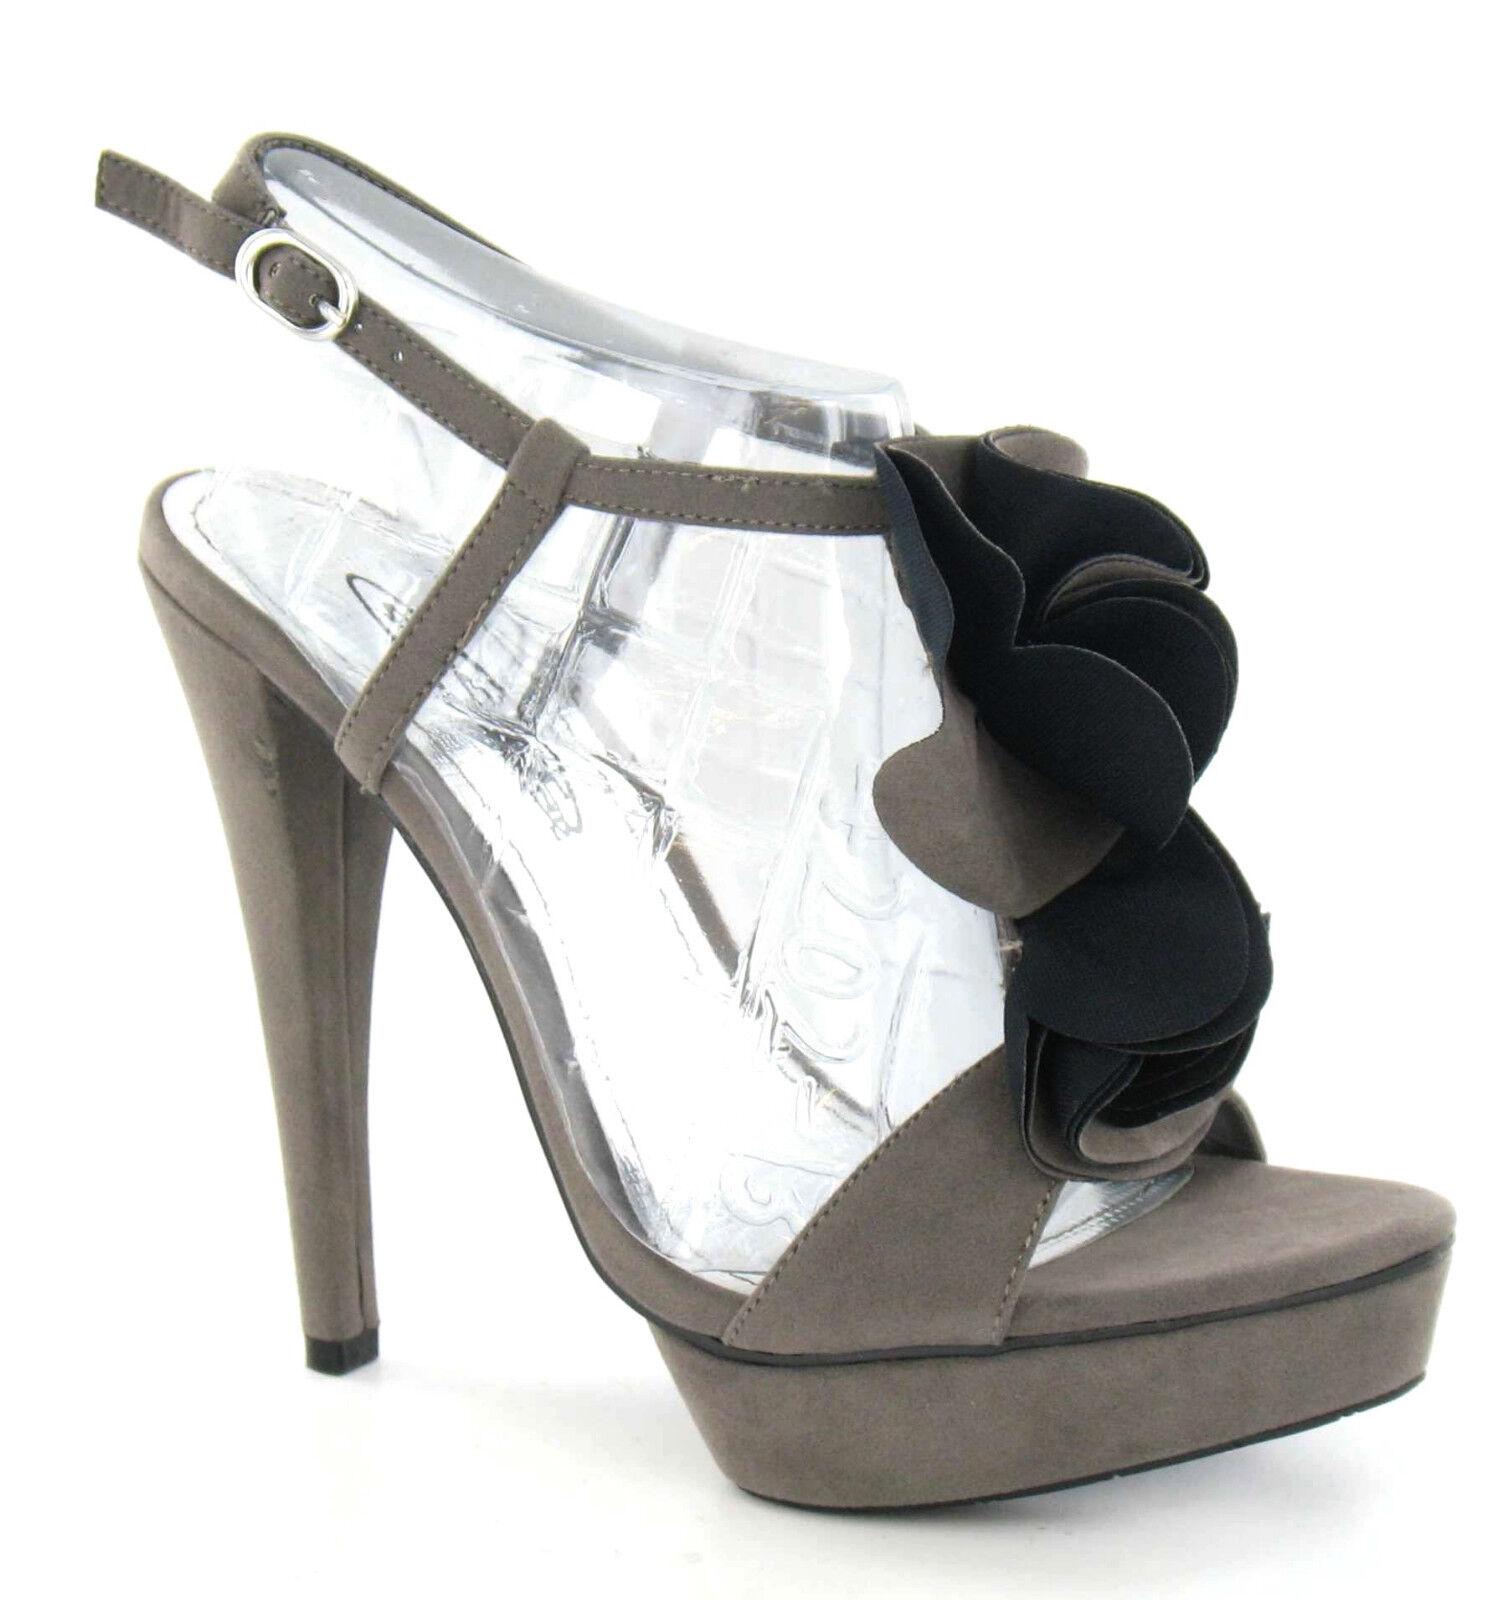 Moda jest prosta i niedroga SPOT ON F1735 da donna grigio camoscio sintetico a balze Scarpe con zeppa (34B)